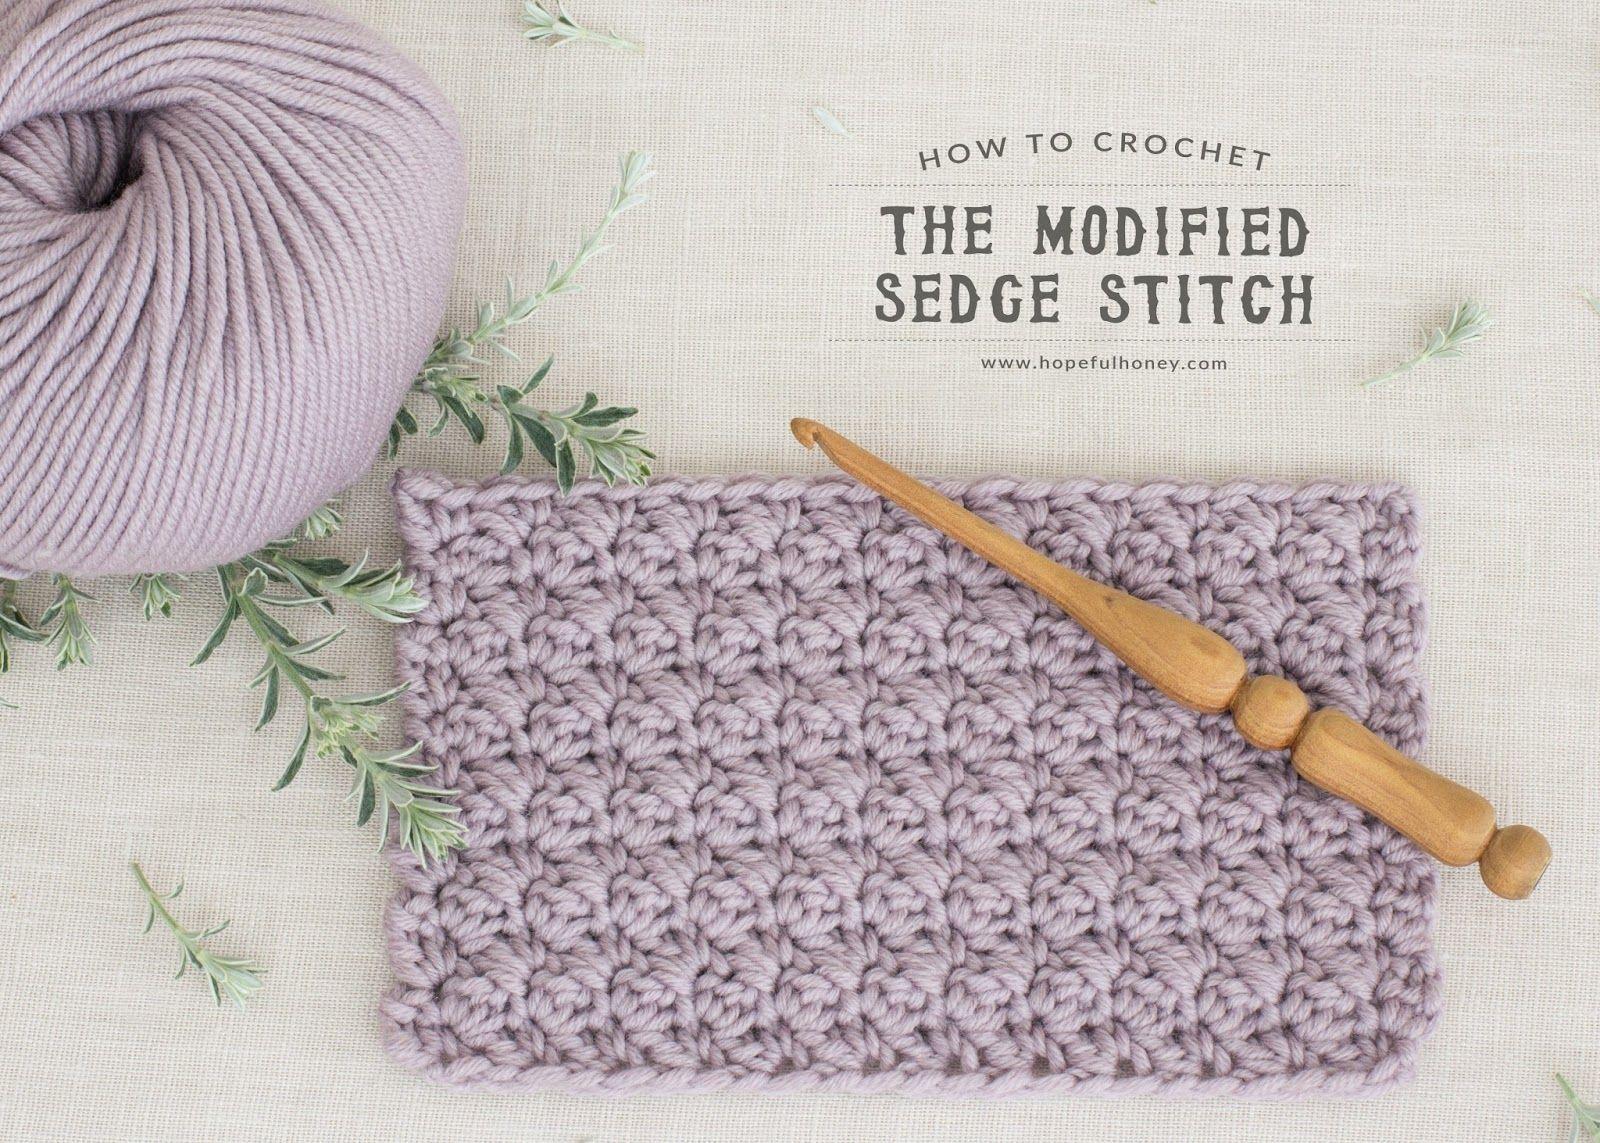 How To Crochet The Modified Sedge Stitch - Tutorial by | Stiche ...